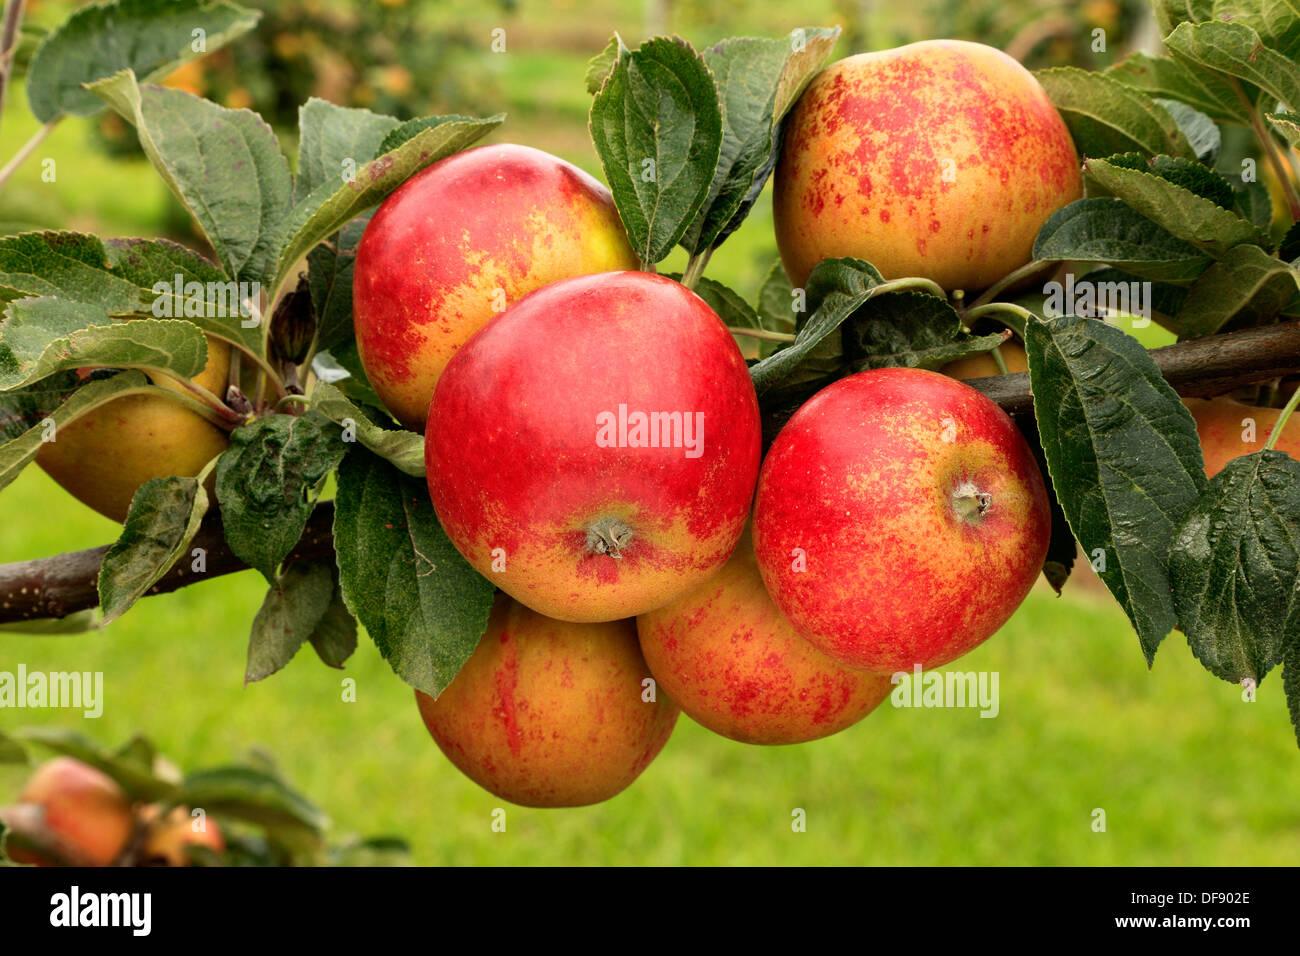 Apple, 'Norfolk Royal Russet', variety growing on tree, fruit red apples England UK - Stock Image